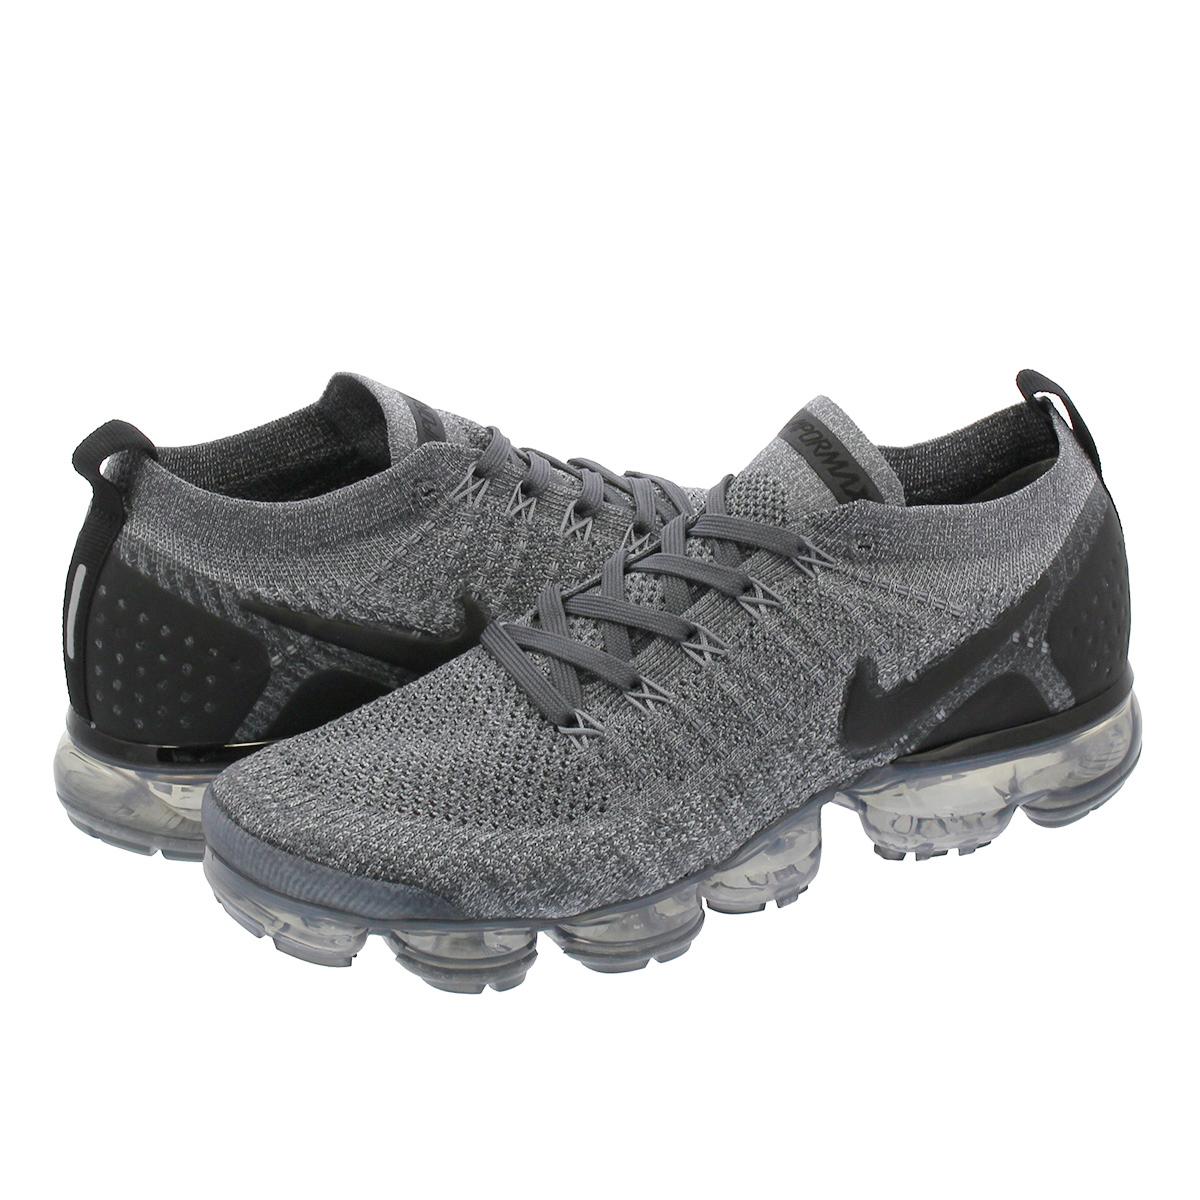 low priced 38b2c 0f332 NIKE AIR VAPORMAX FLYKNIT 2 Nike vapor max fried food knit 2 DARK  GREY/WHITE/WOLF GREY/BLACK 942,842-002